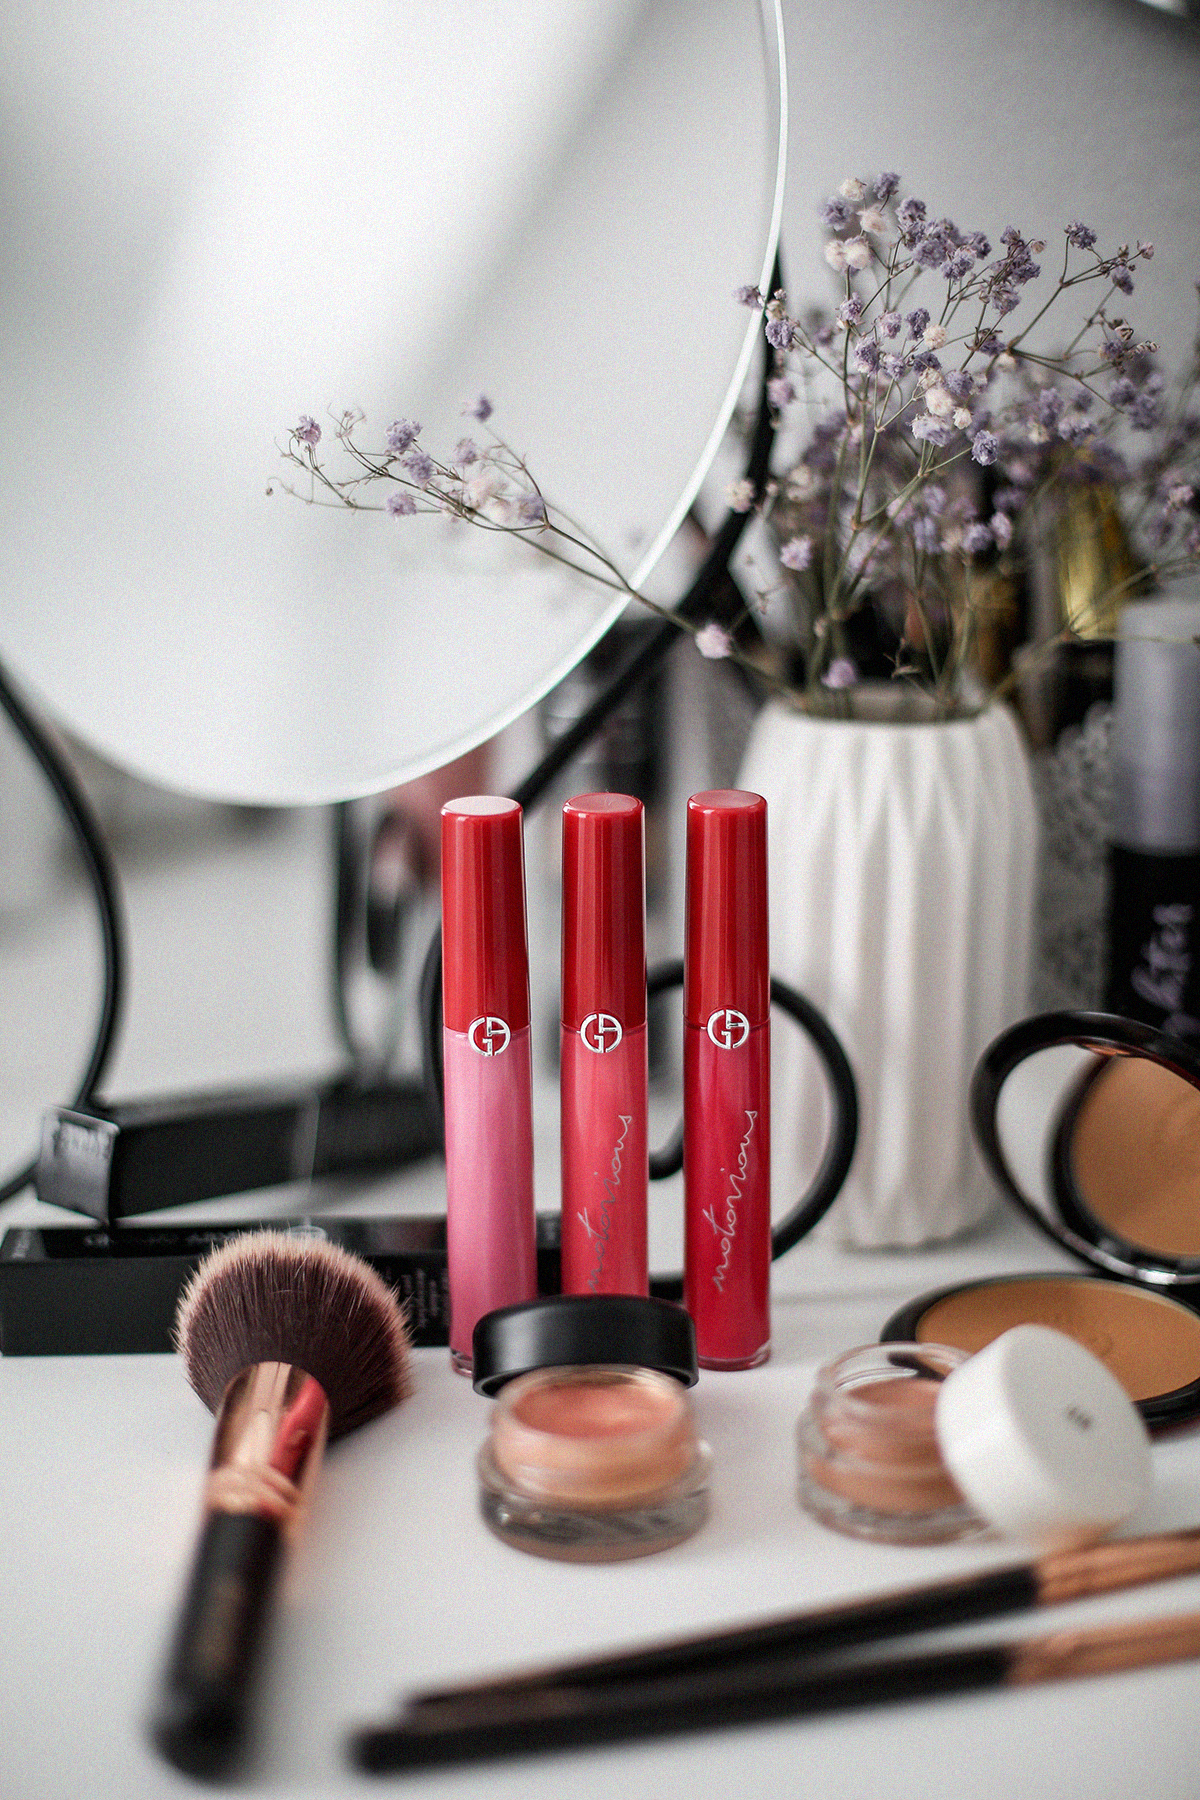 lip-maestro-notorious-giorgio-armani-beauty-review-make-up-myblueberrynishtblog6